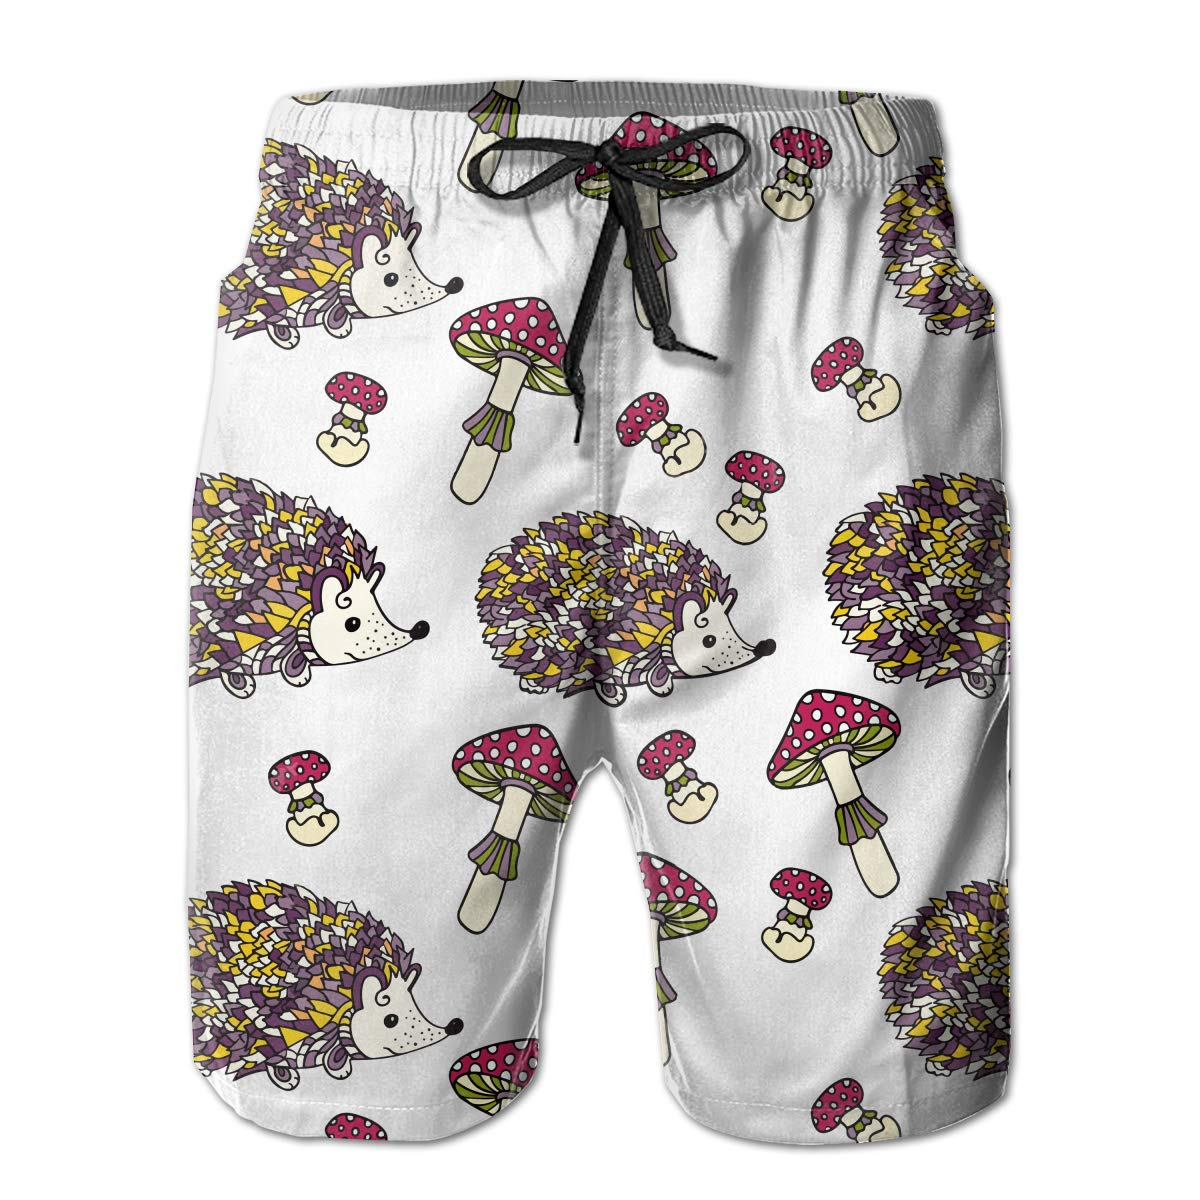 JF-X Hedgehog with Mushroom Mens Summer Beach Surf Board Shorts Quick Dry Swimming Trunks Casual Loose Sleep Short Pants